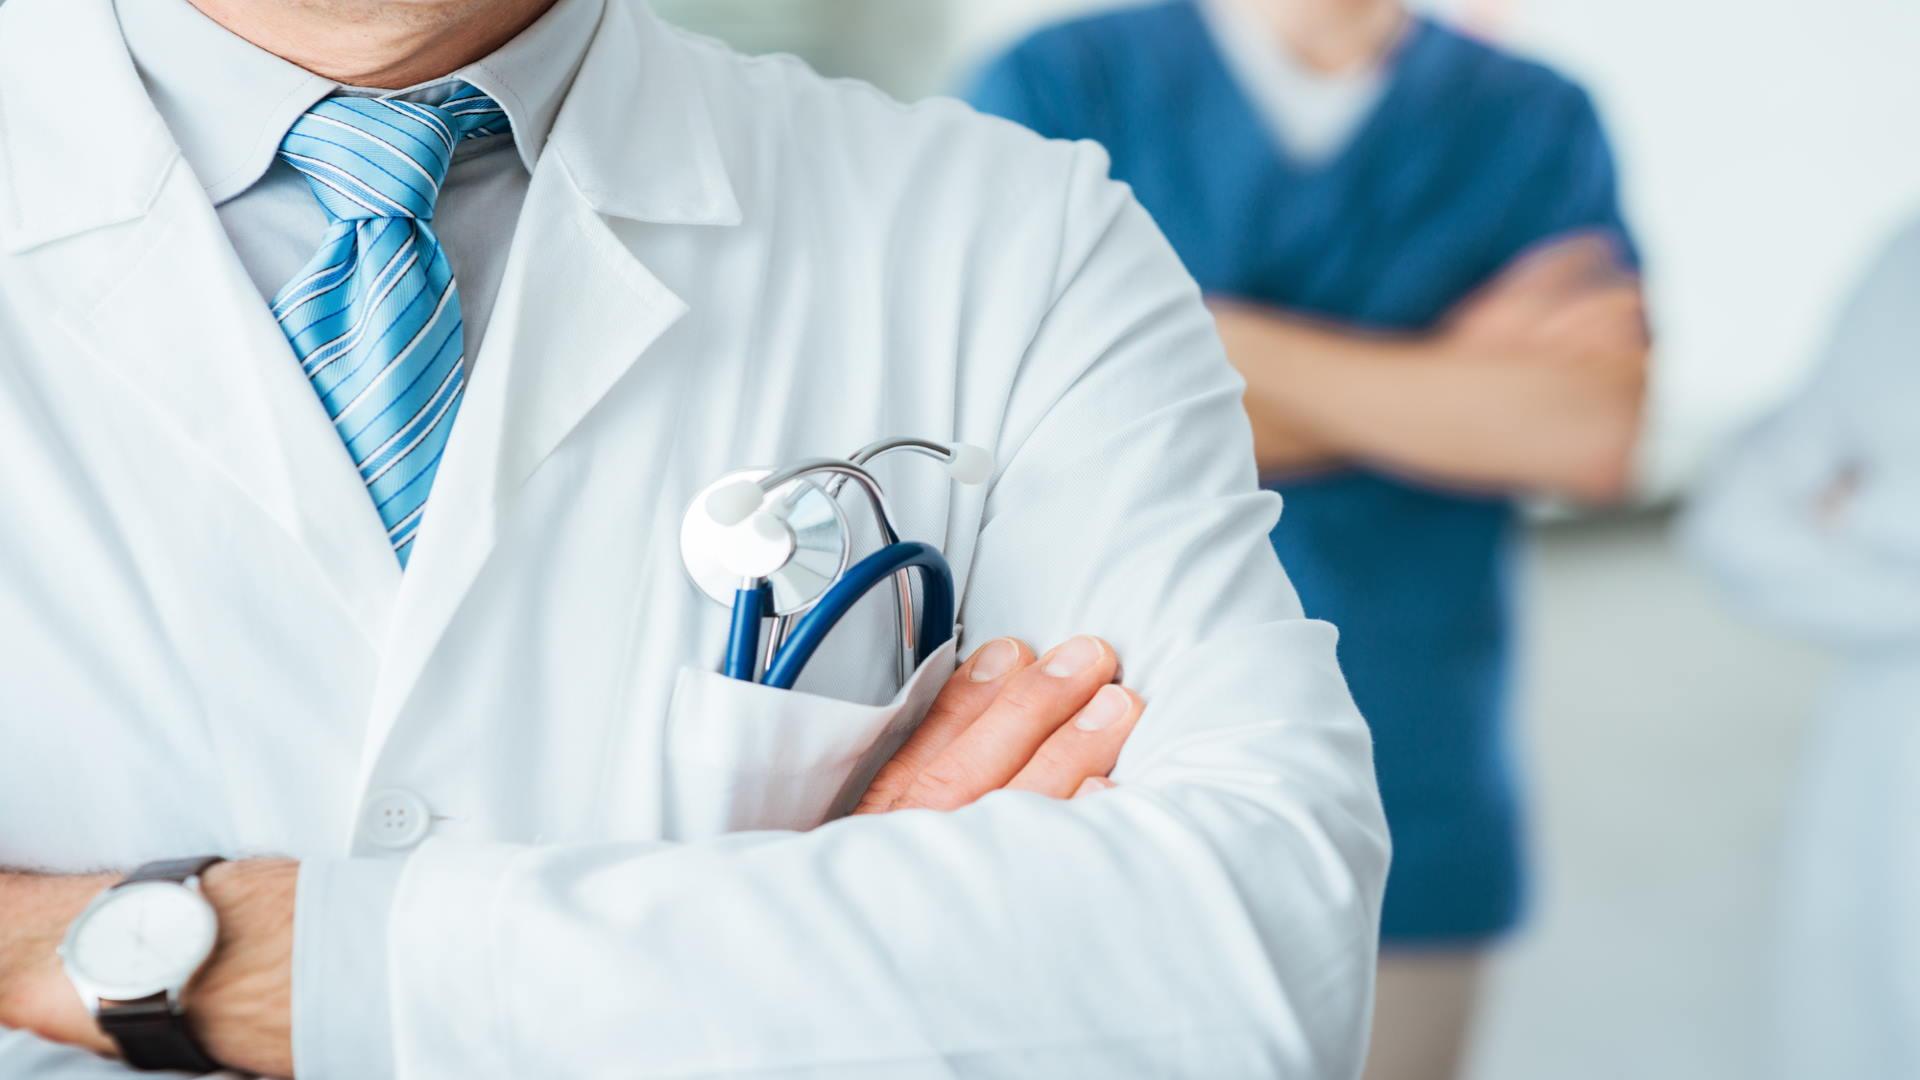 Treating Coronavirus with Natural Medicine